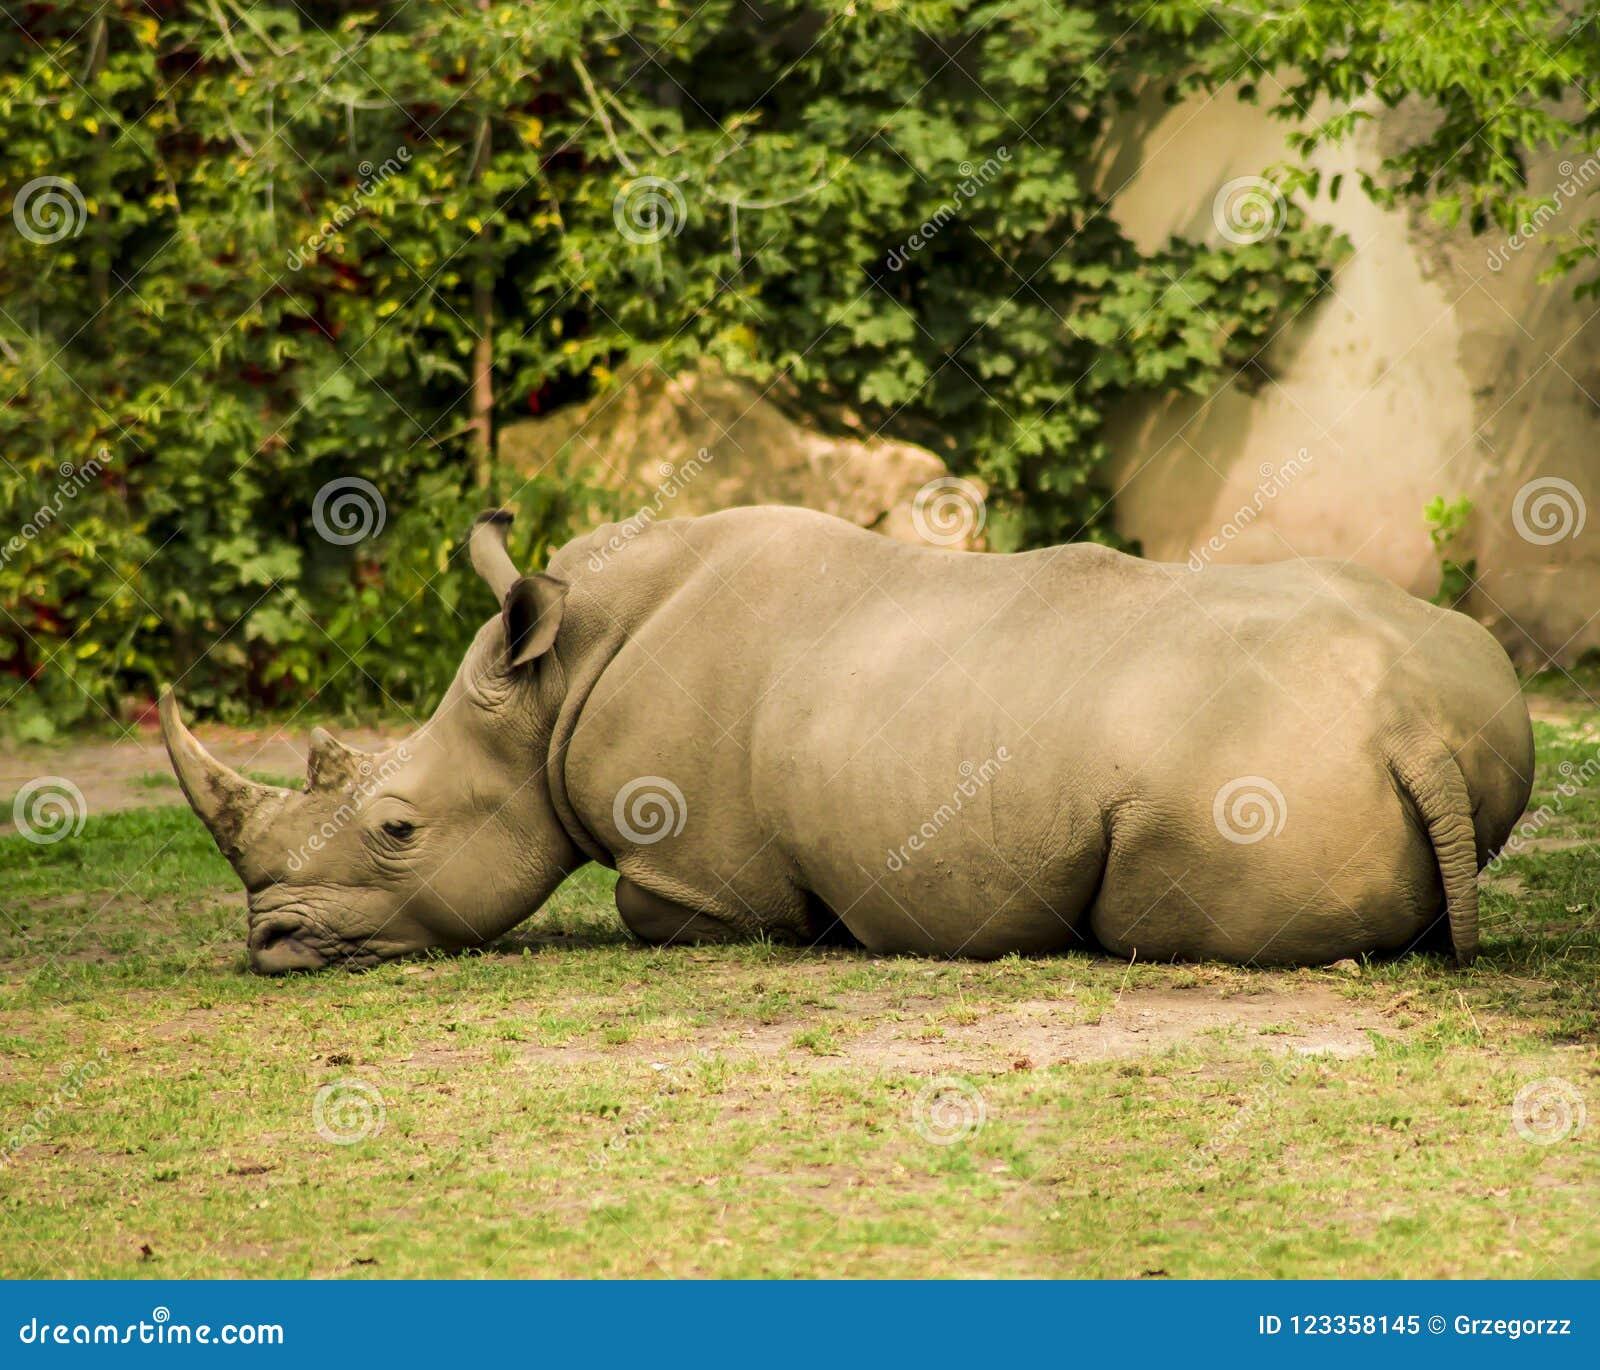 Lying Rhino Against The Background Of Rocks And Vegetation